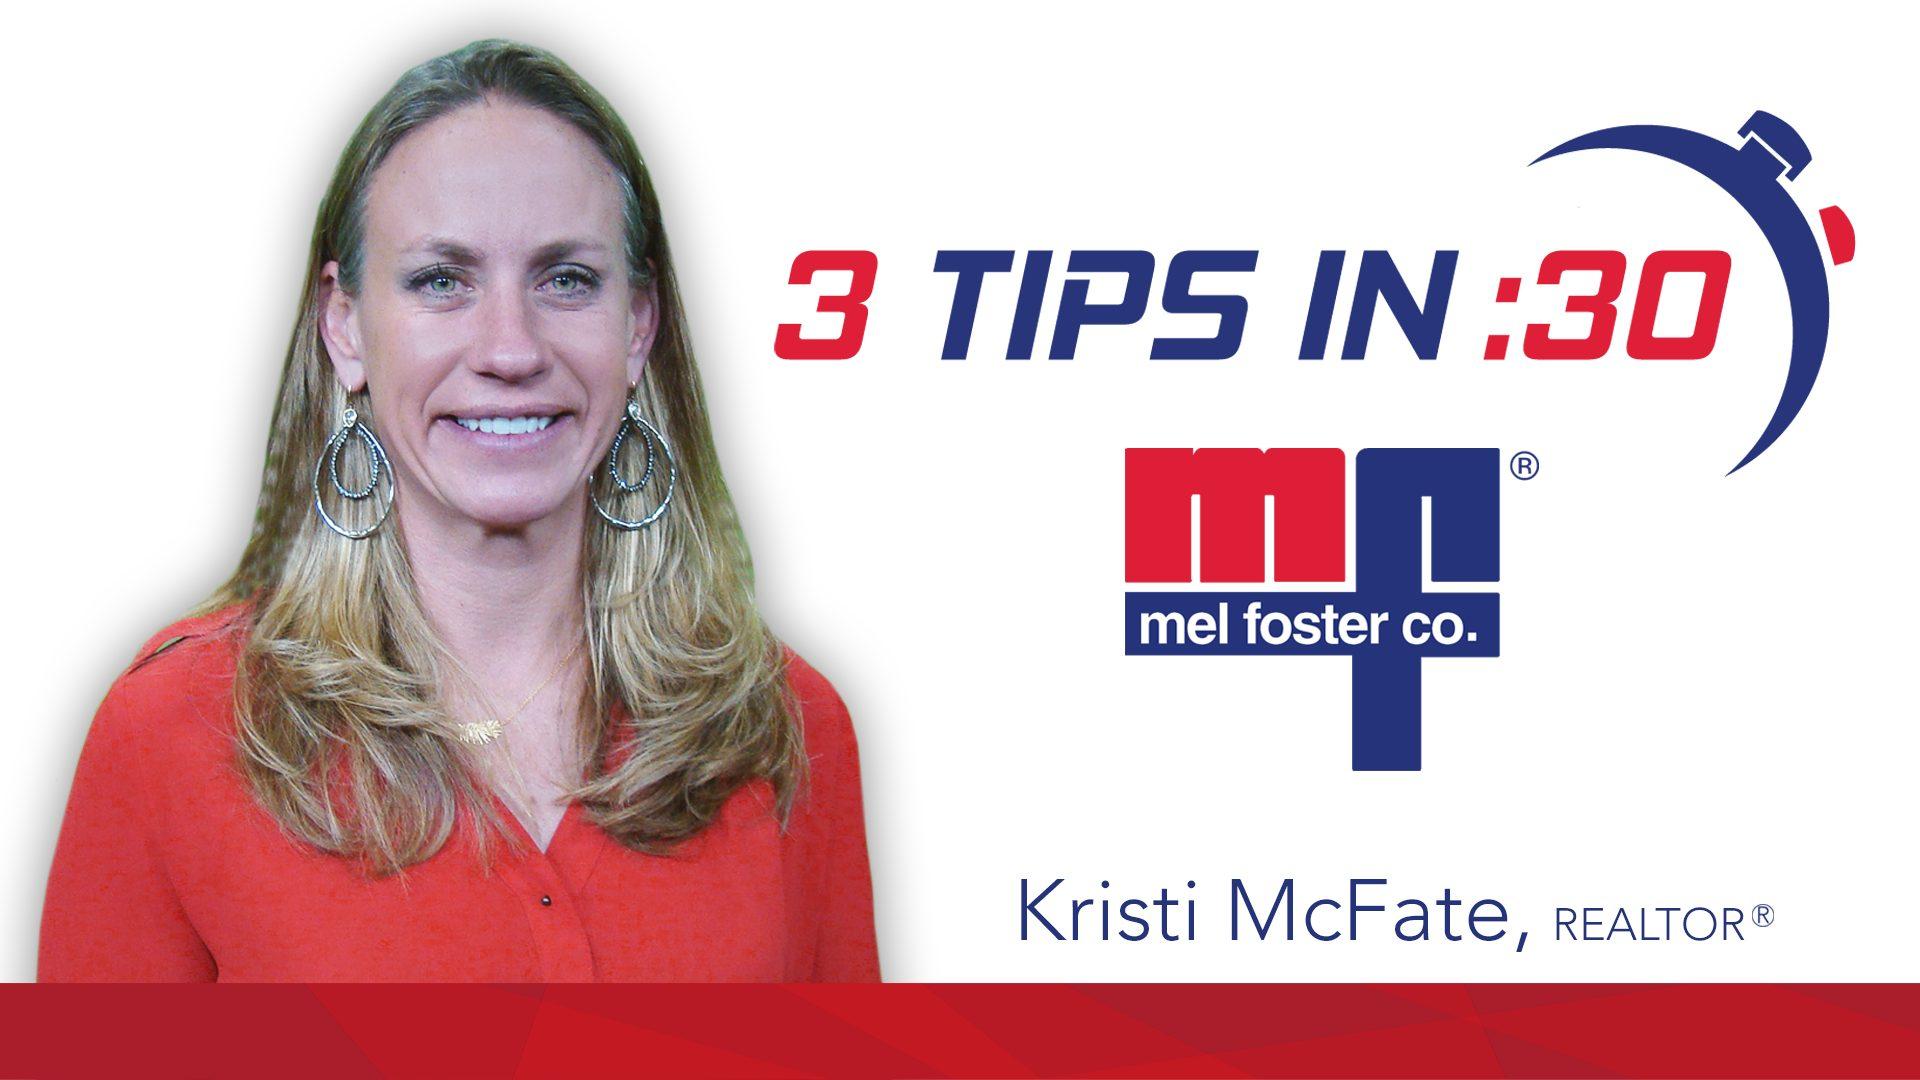 Kristi McFate, REALTOR® at Mel Foster Co.